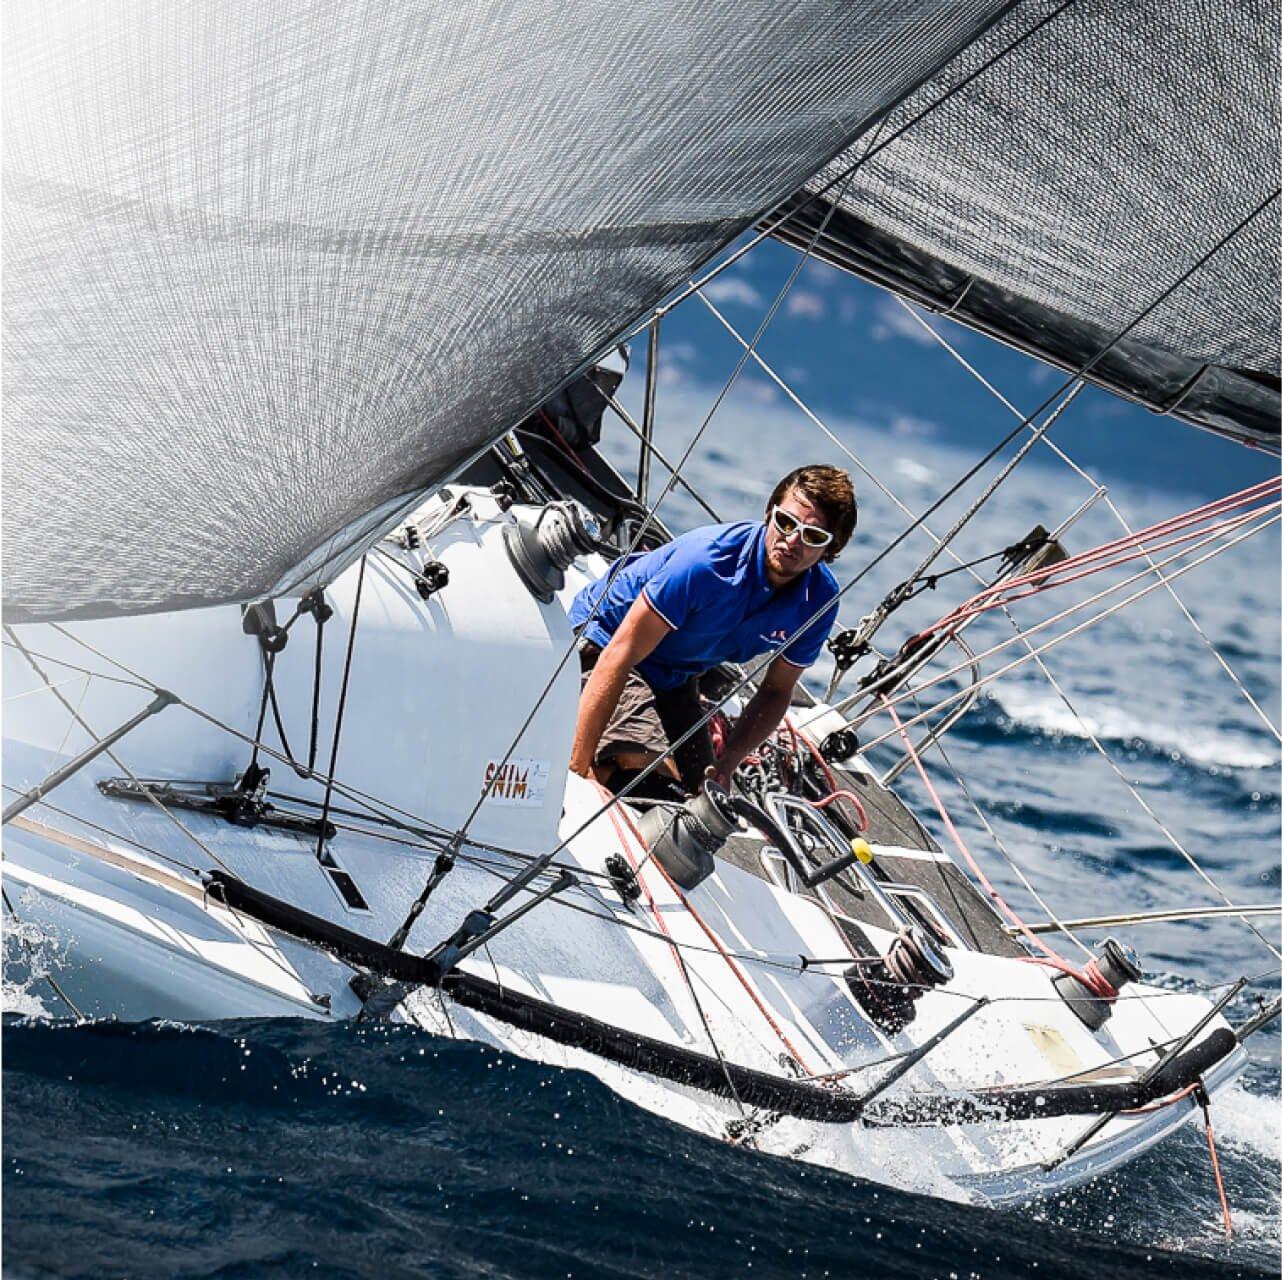 Rolex Giraglia, a regatta born of friendship